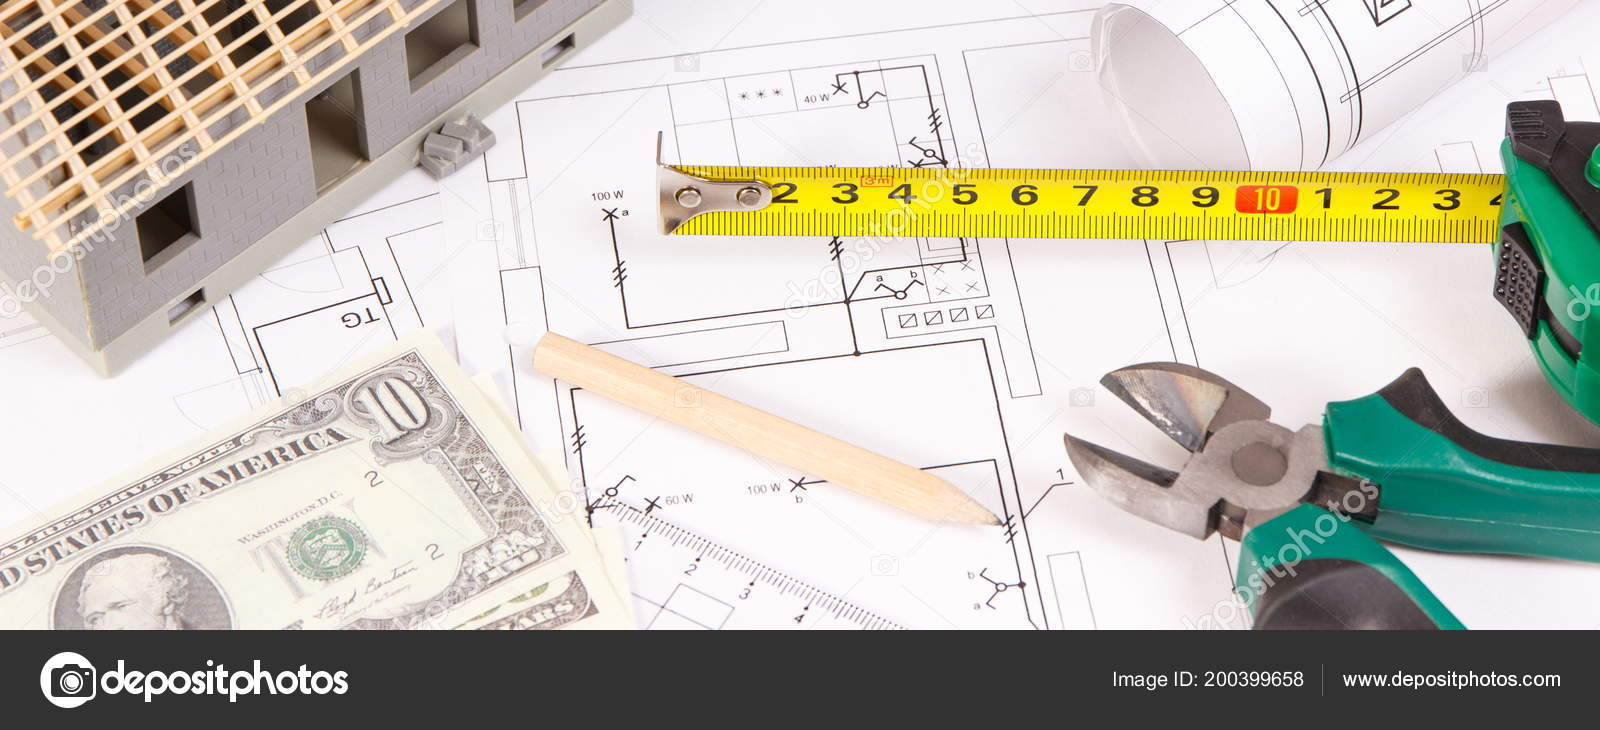 electrical construction drawings diagrams work tools engineer jobs rh depositphotos com electrical schematics electrical schematics